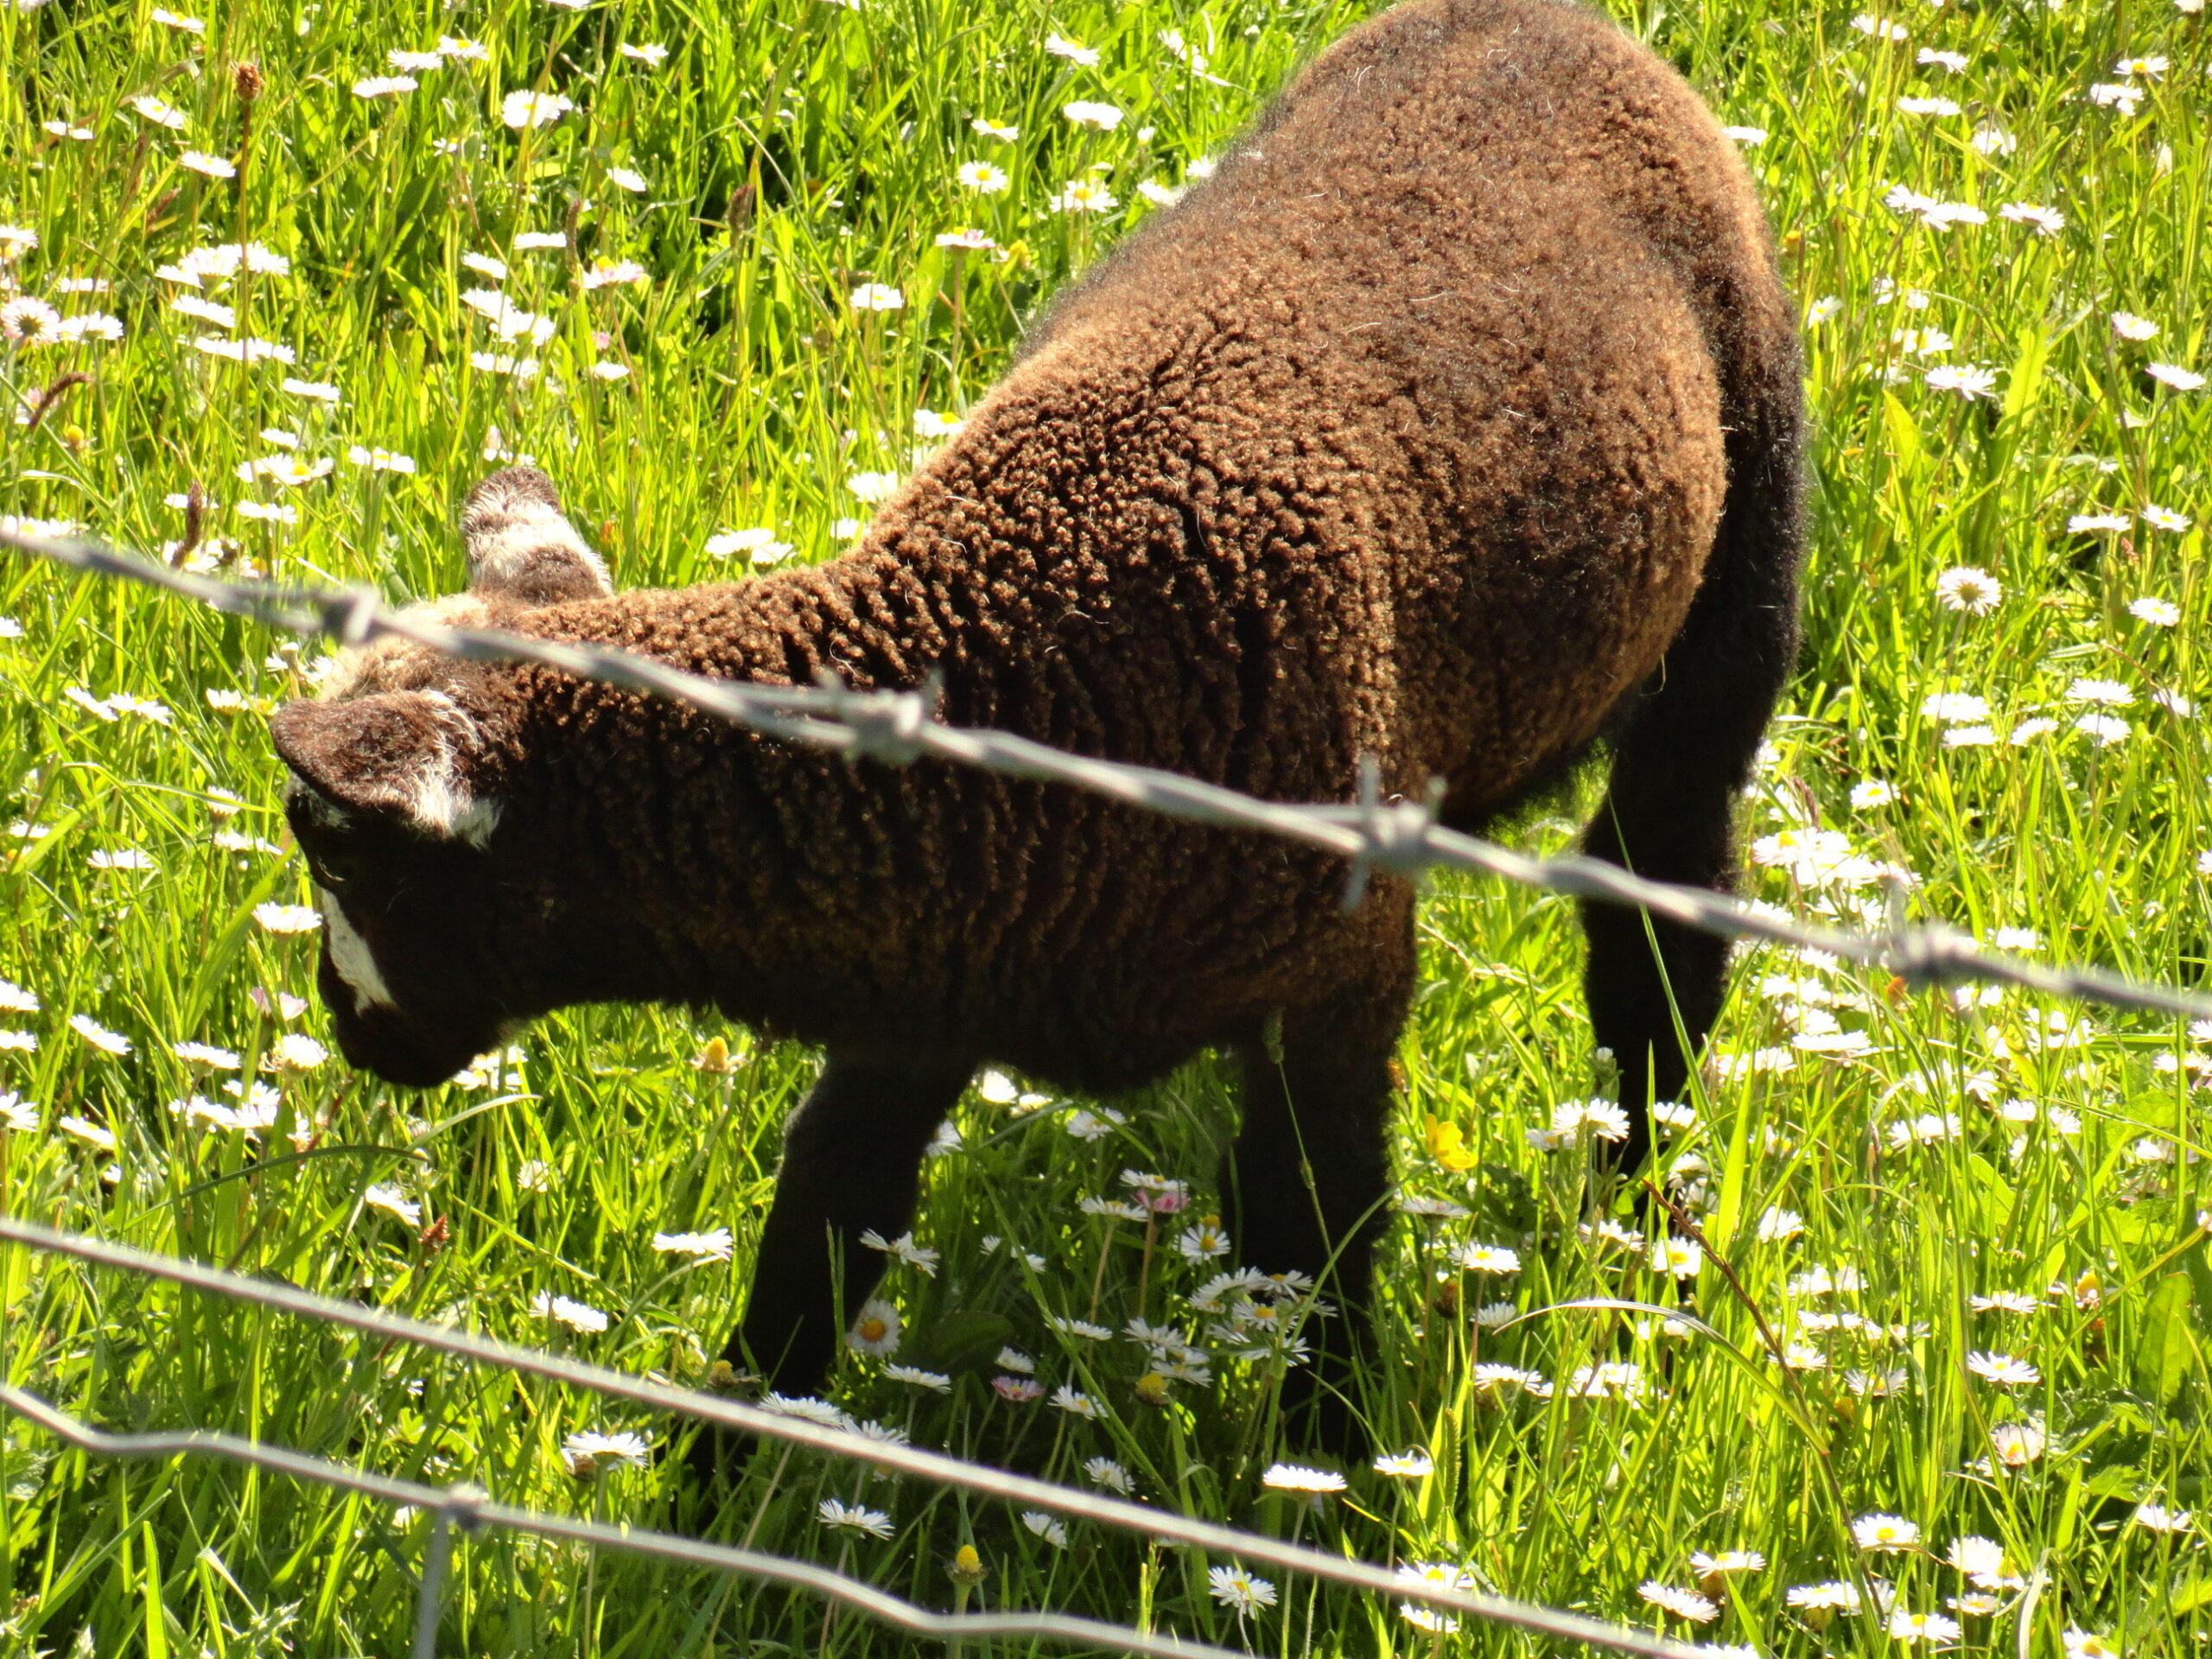 photo of a sheep near a fence